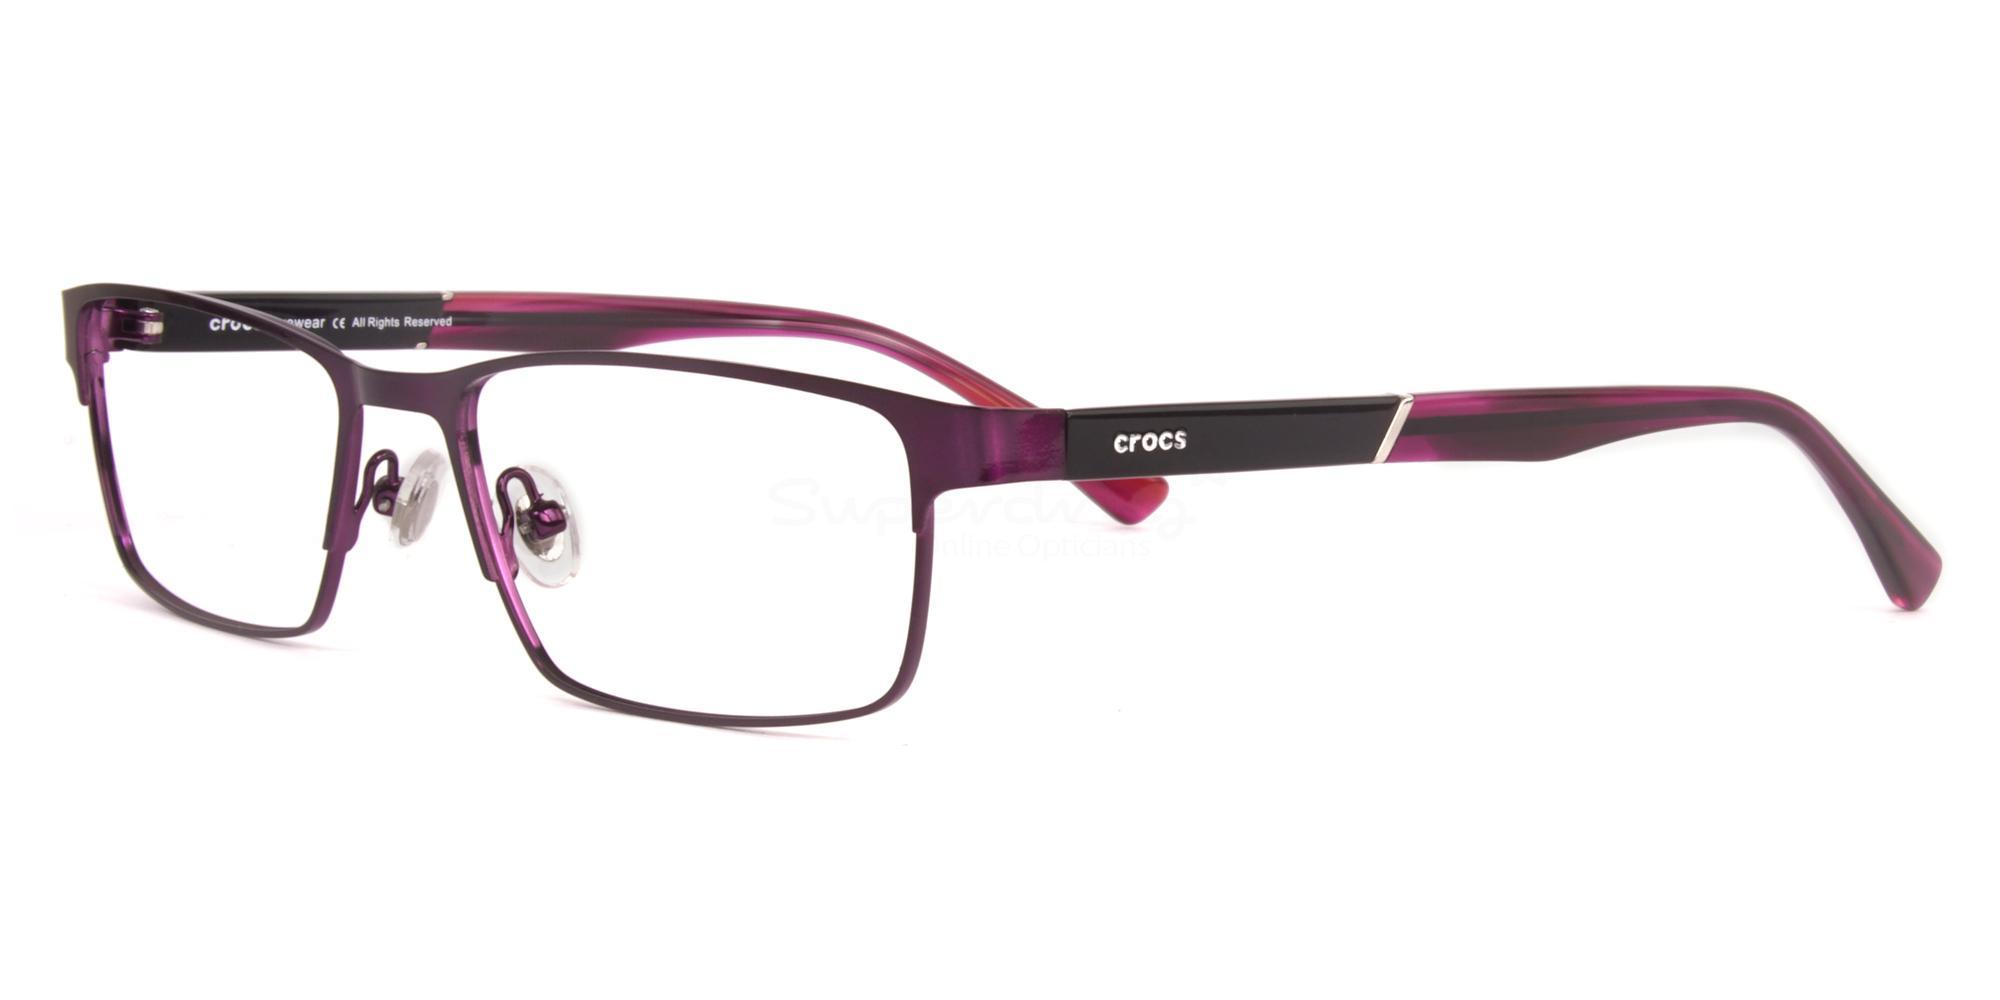 35PE CF4332 Glasses, Crocs Eyewear